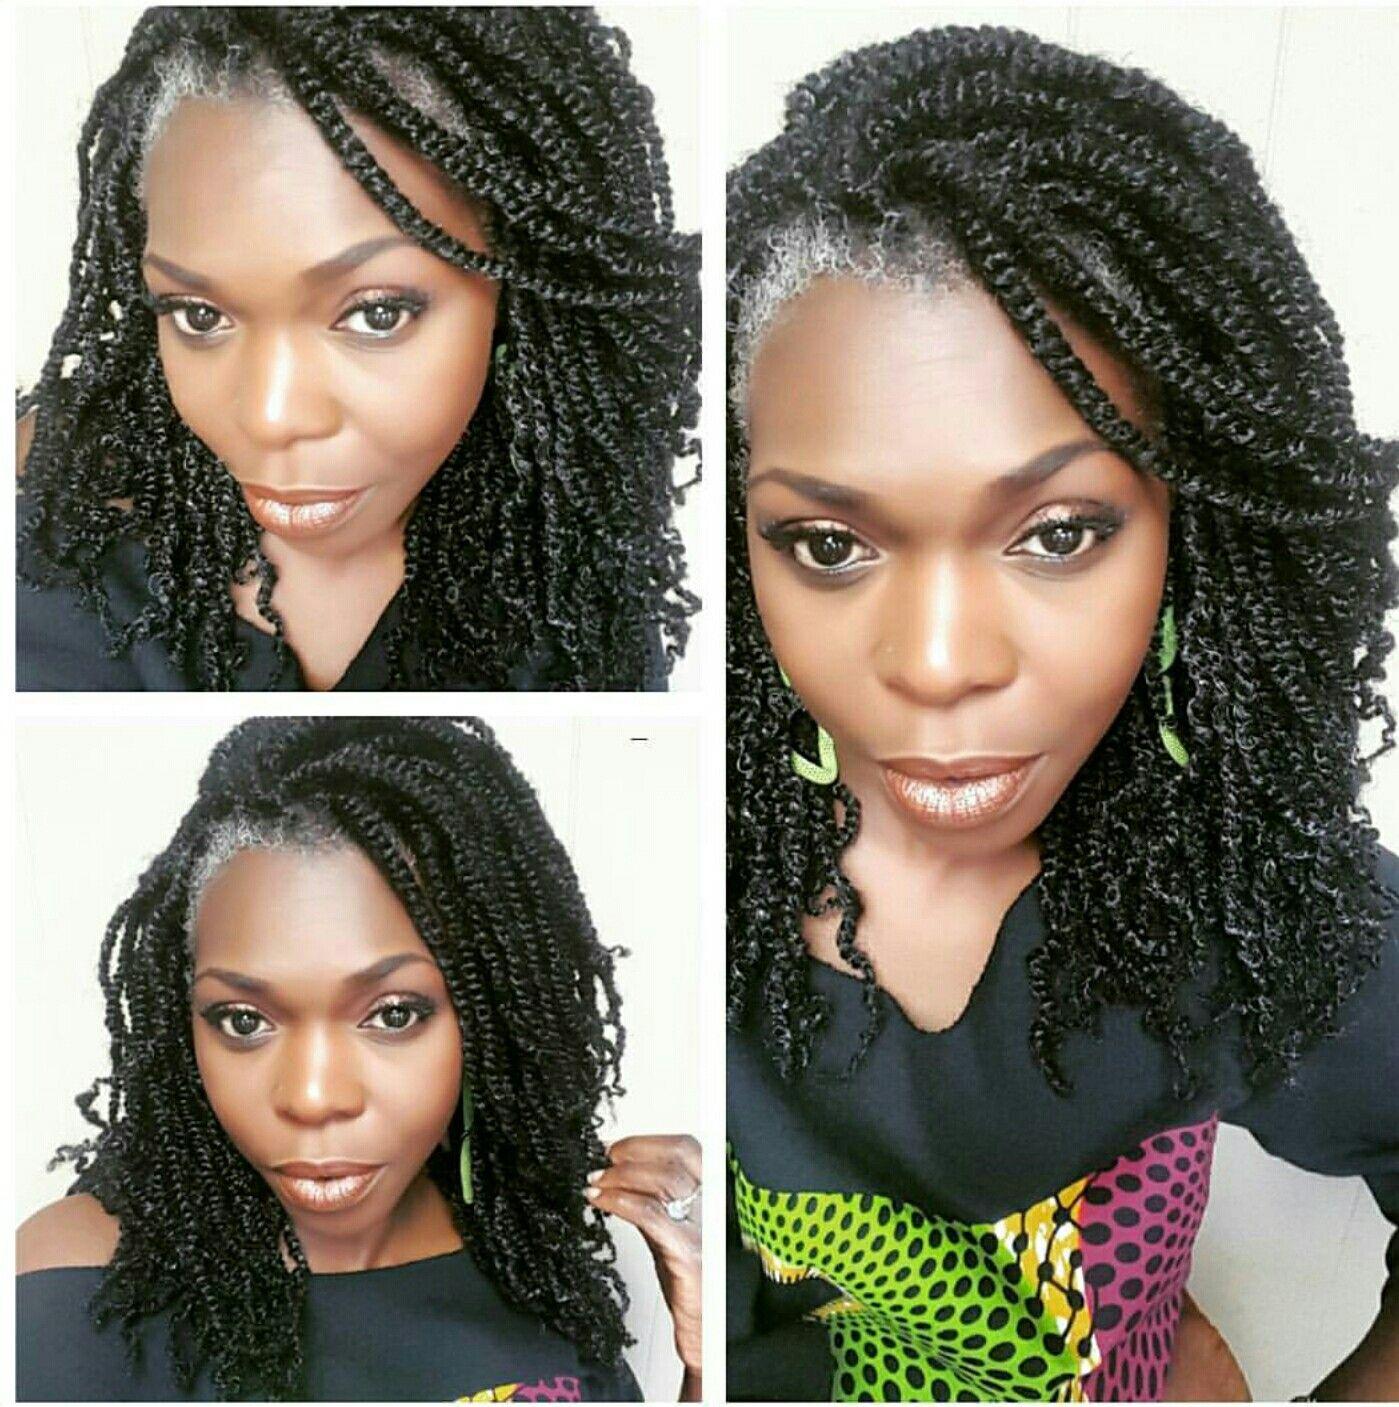 Grey 2 Strand Twist Extensions By Necijones For Mandisa Ngozi